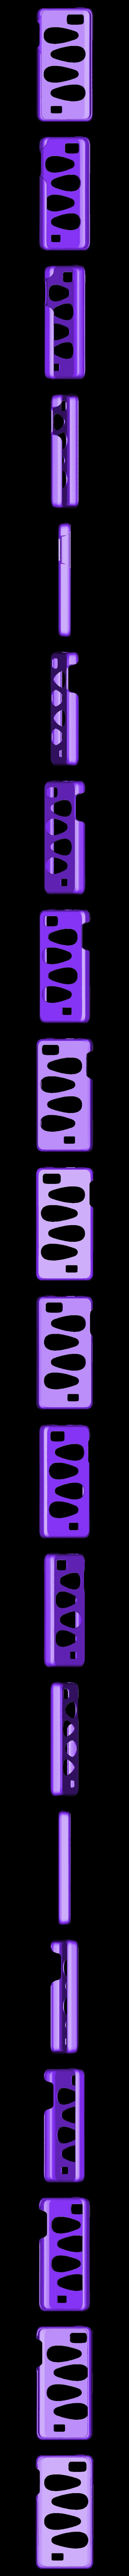 Drops.stl Download free STL file Fairphone Case #1: Drop Cutout • 3D printable model, Numbmond